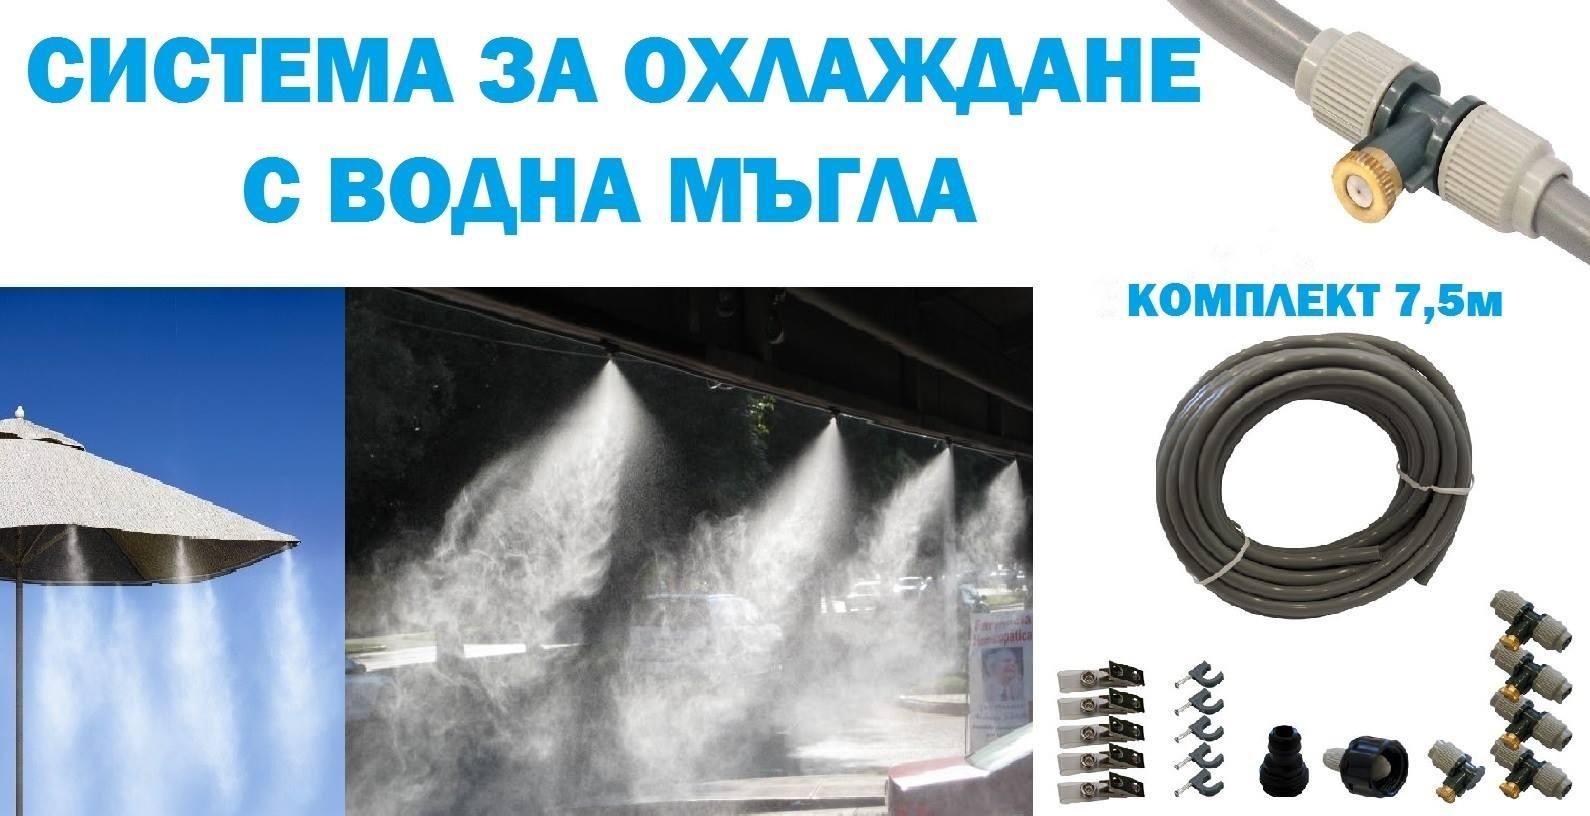 Система за охлаждане с водна мъгла 7,5м